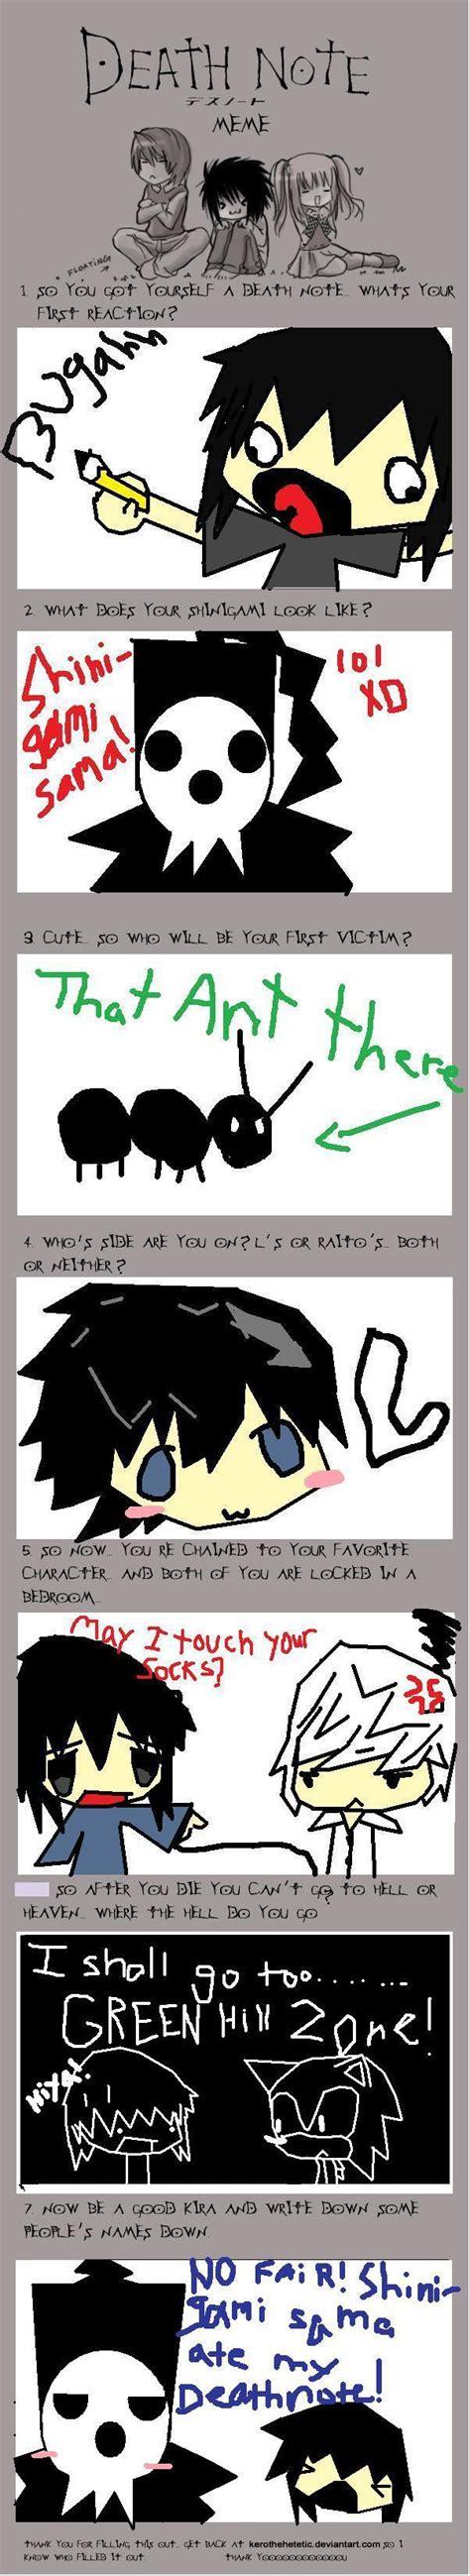 Death Note Meme - l death note funny memes